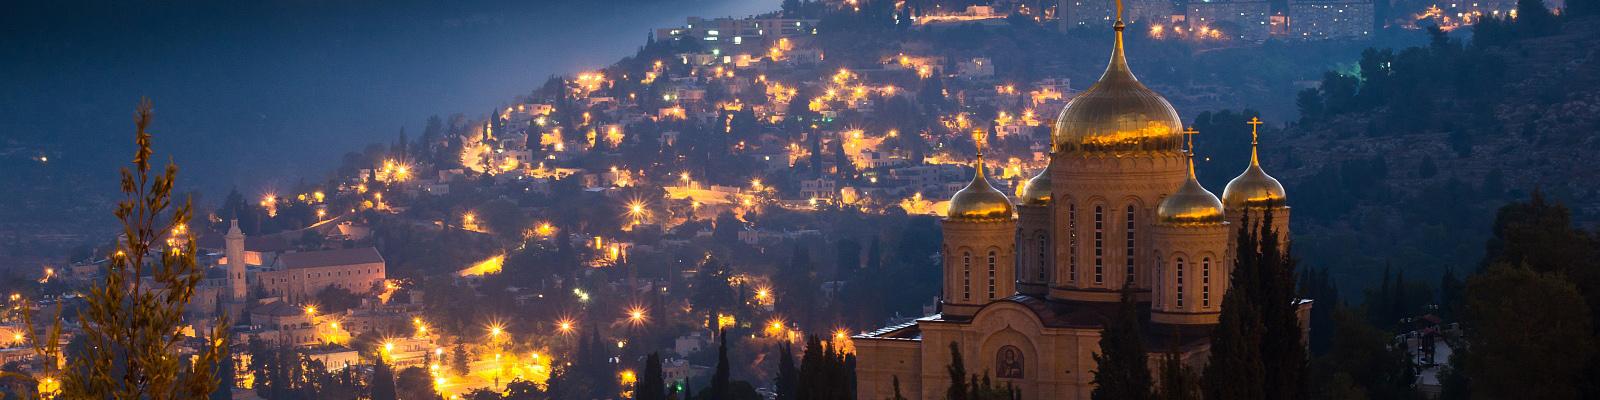 Gorny Monastery, Jerusalem